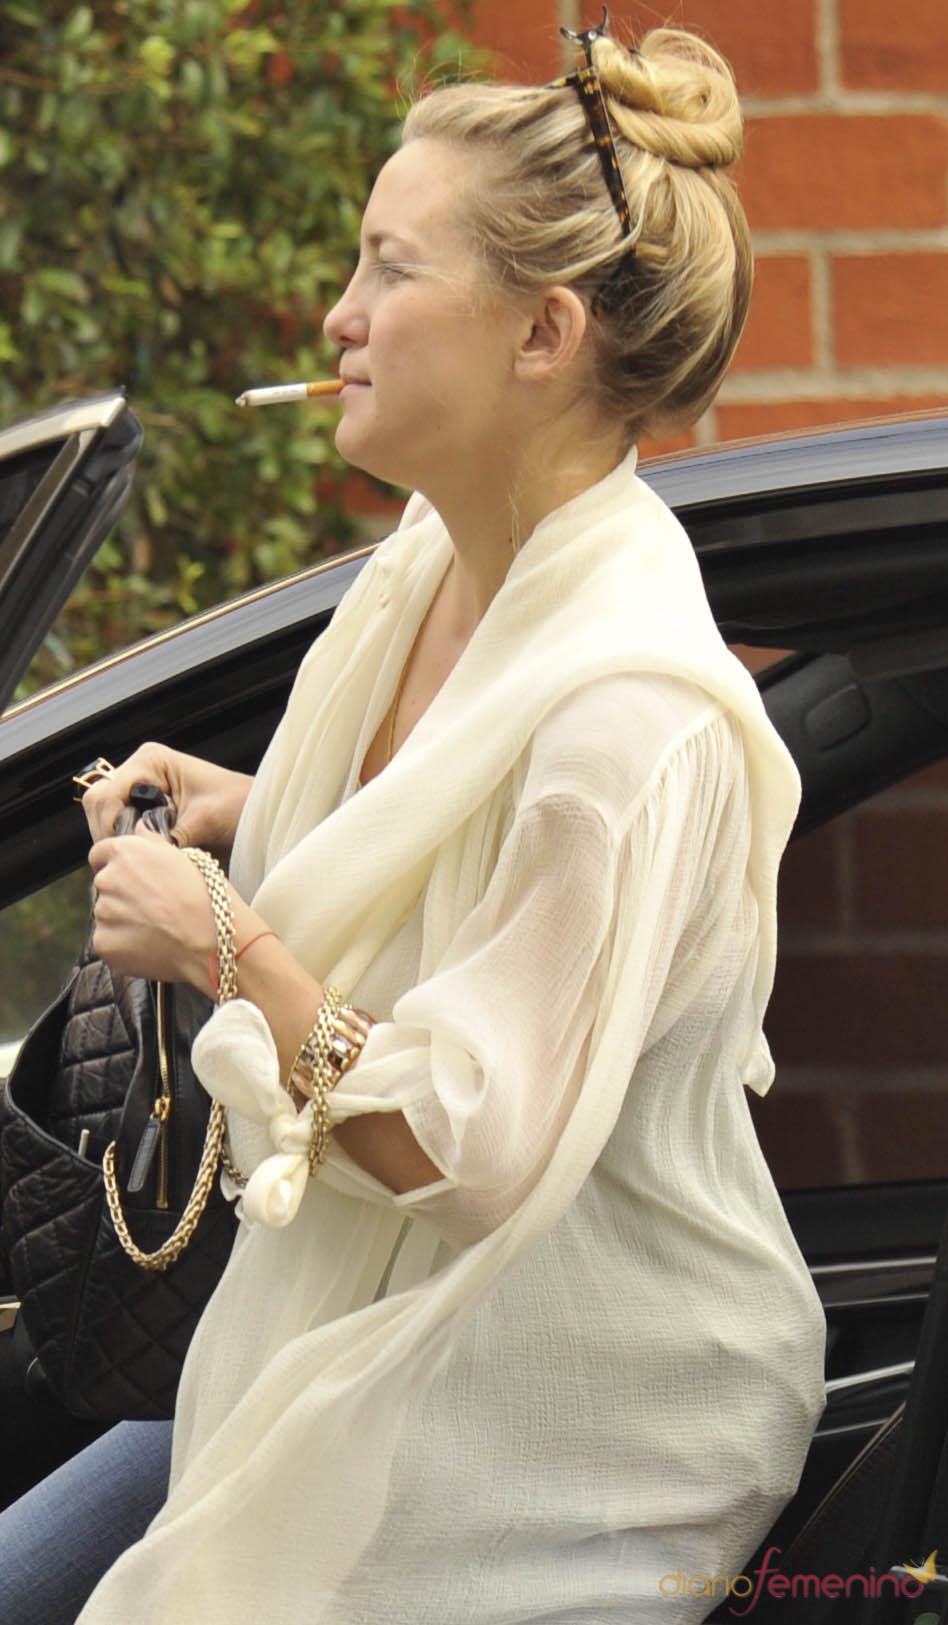 Kate Hudson entra en su coche en Beverly Hills fumando